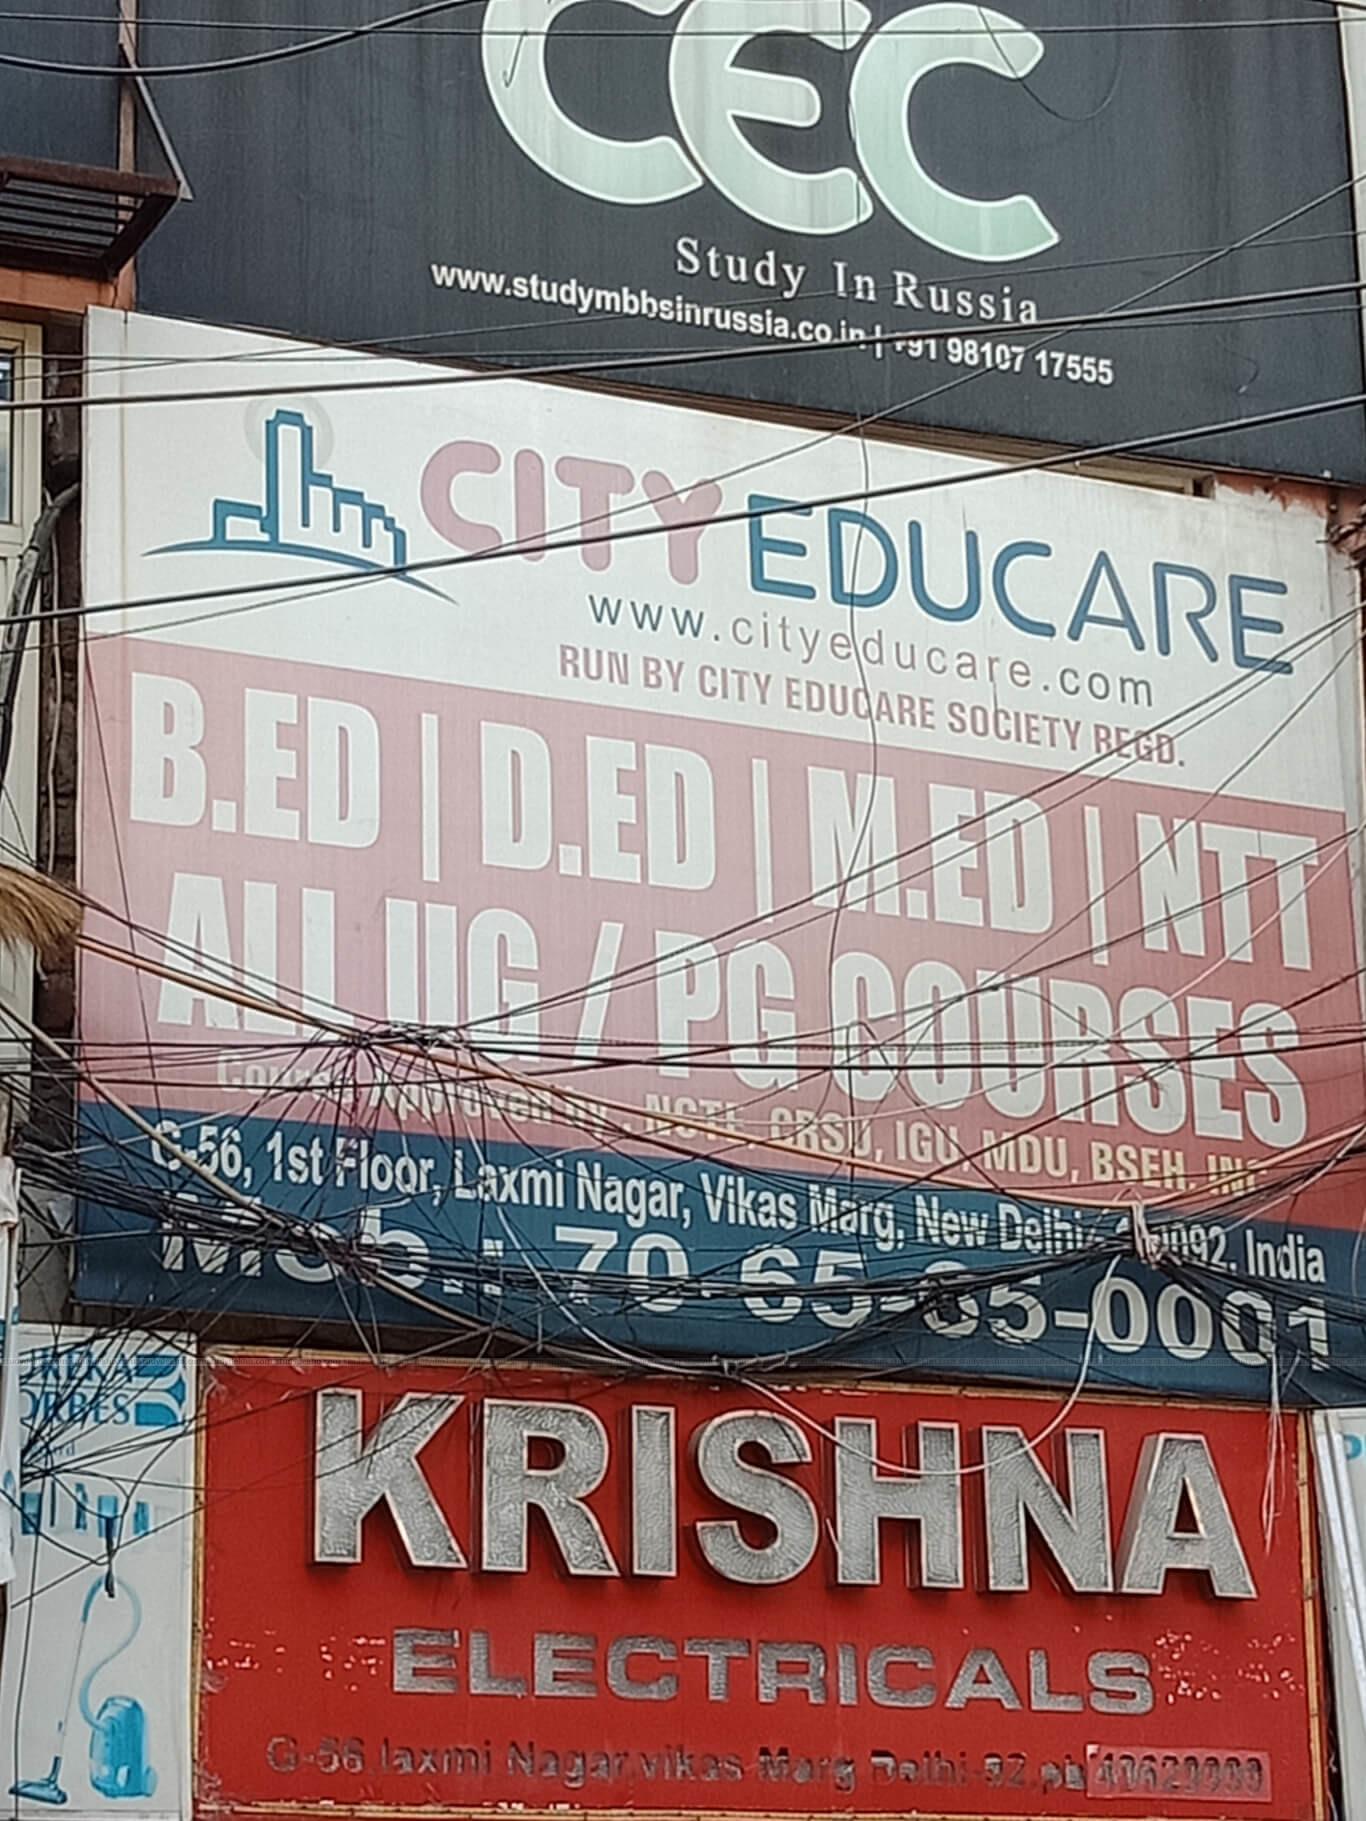 CITY EDUCARE Logo